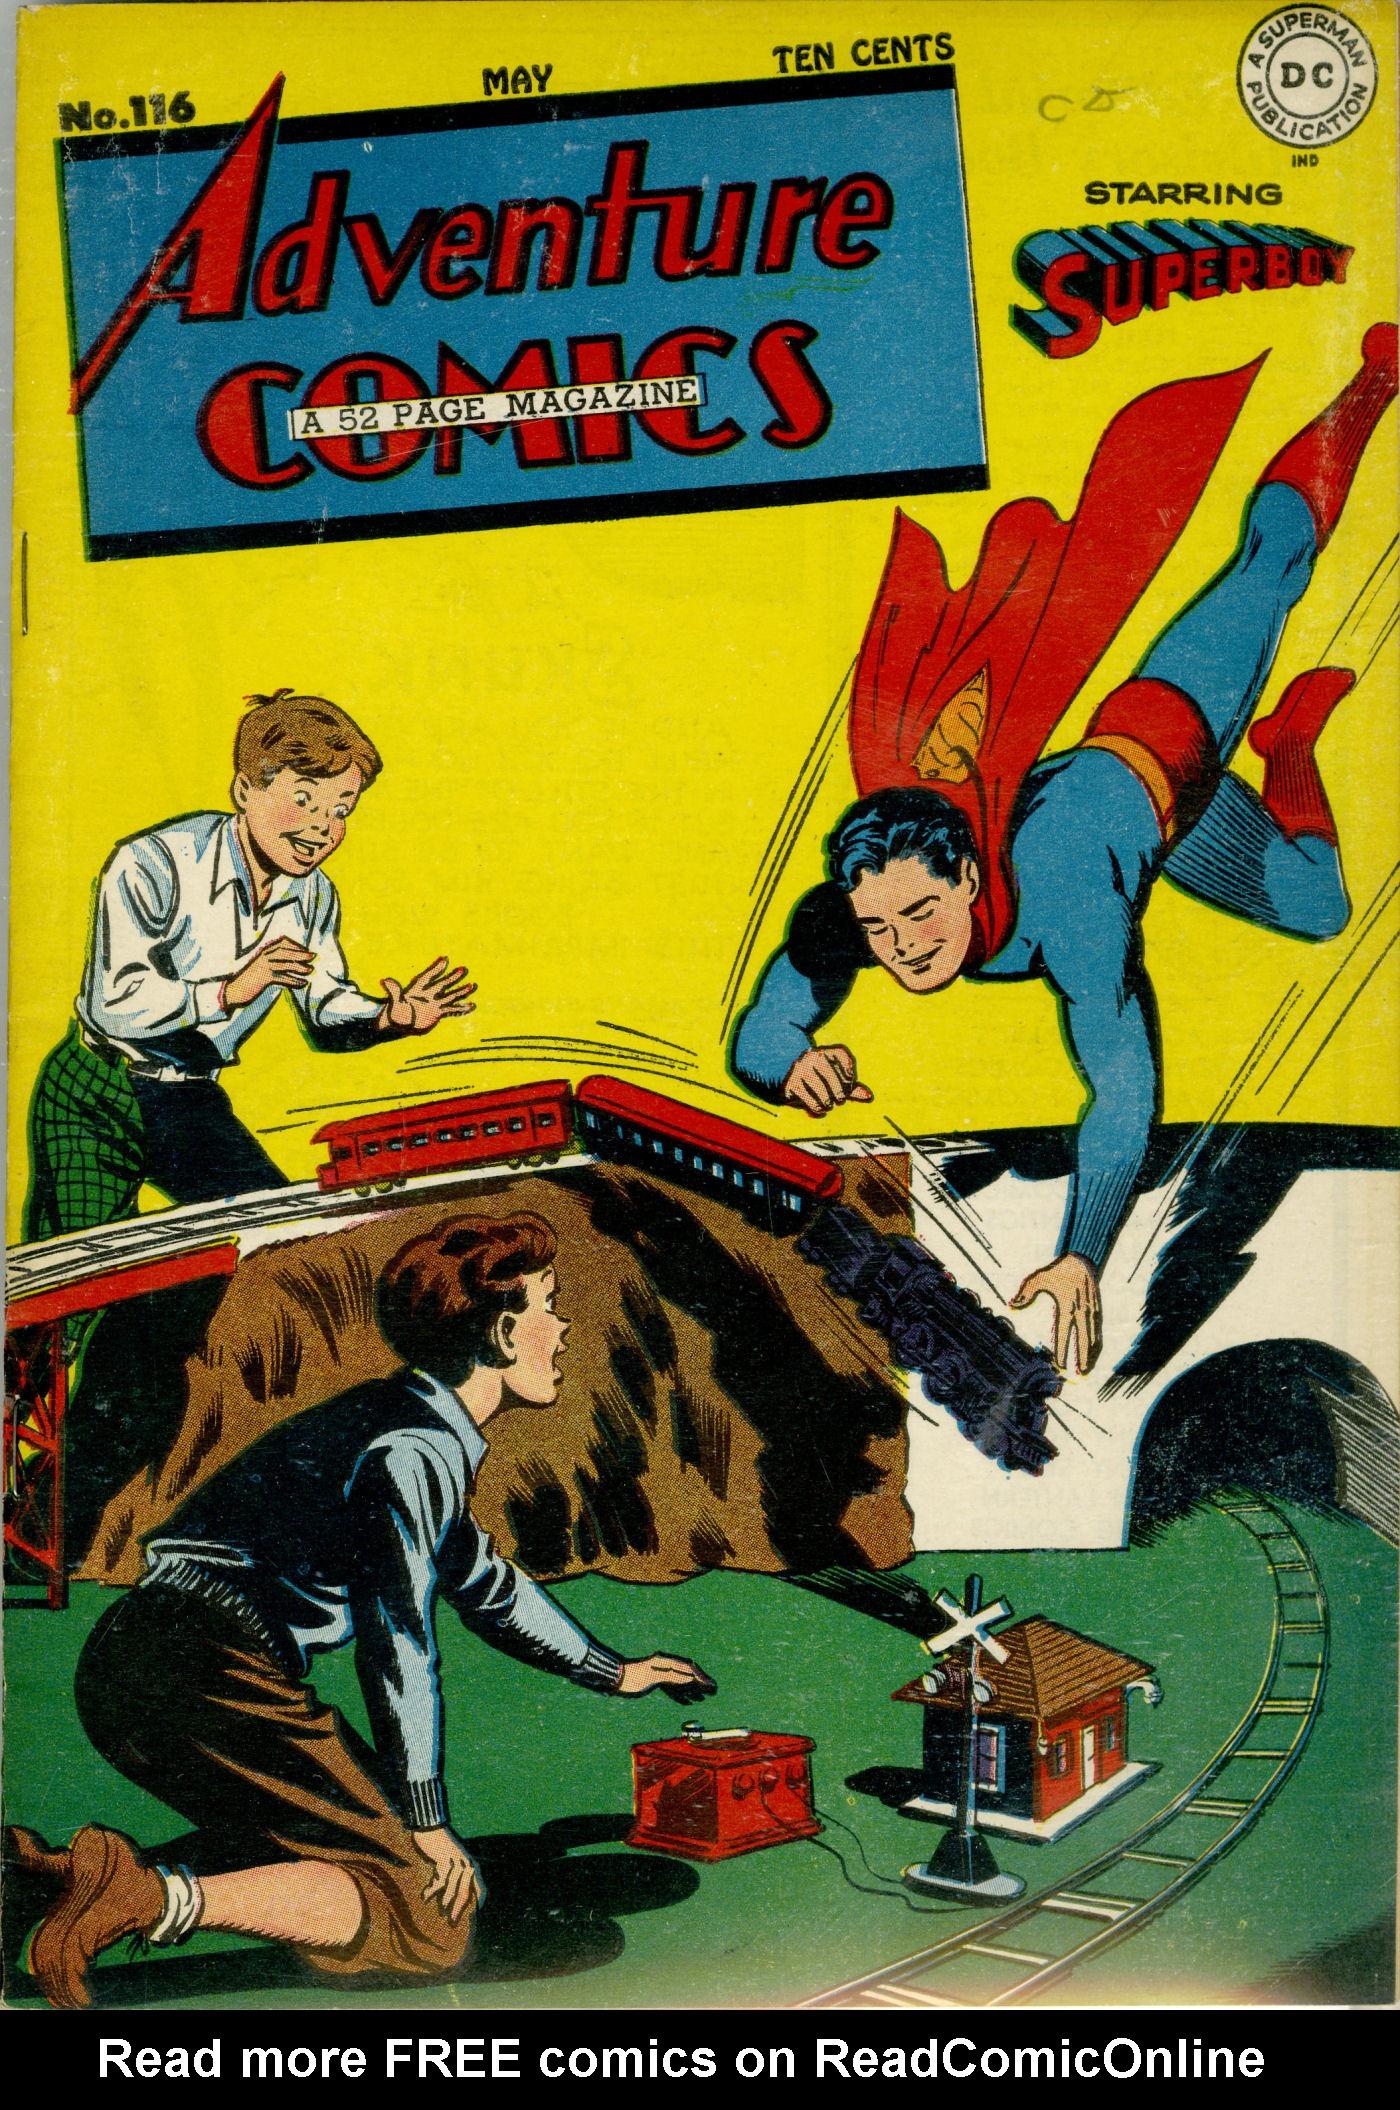 Read online Adventure Comics (1938) comic -  Issue #116 - 2